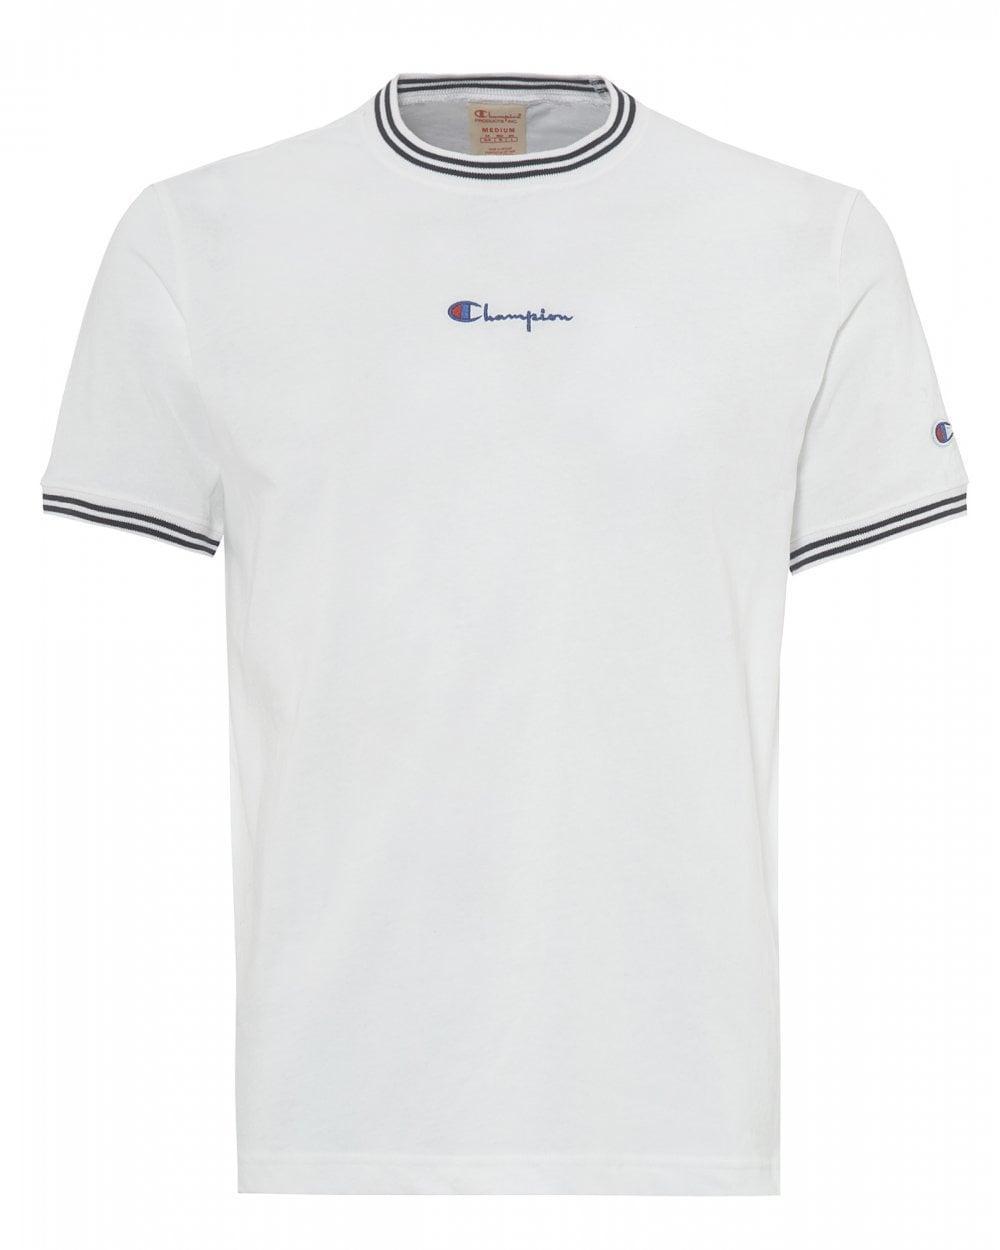 aac5643e4 Lyst - Champion White Striped Ringer Script Tee, Small Logo T-shirt ...